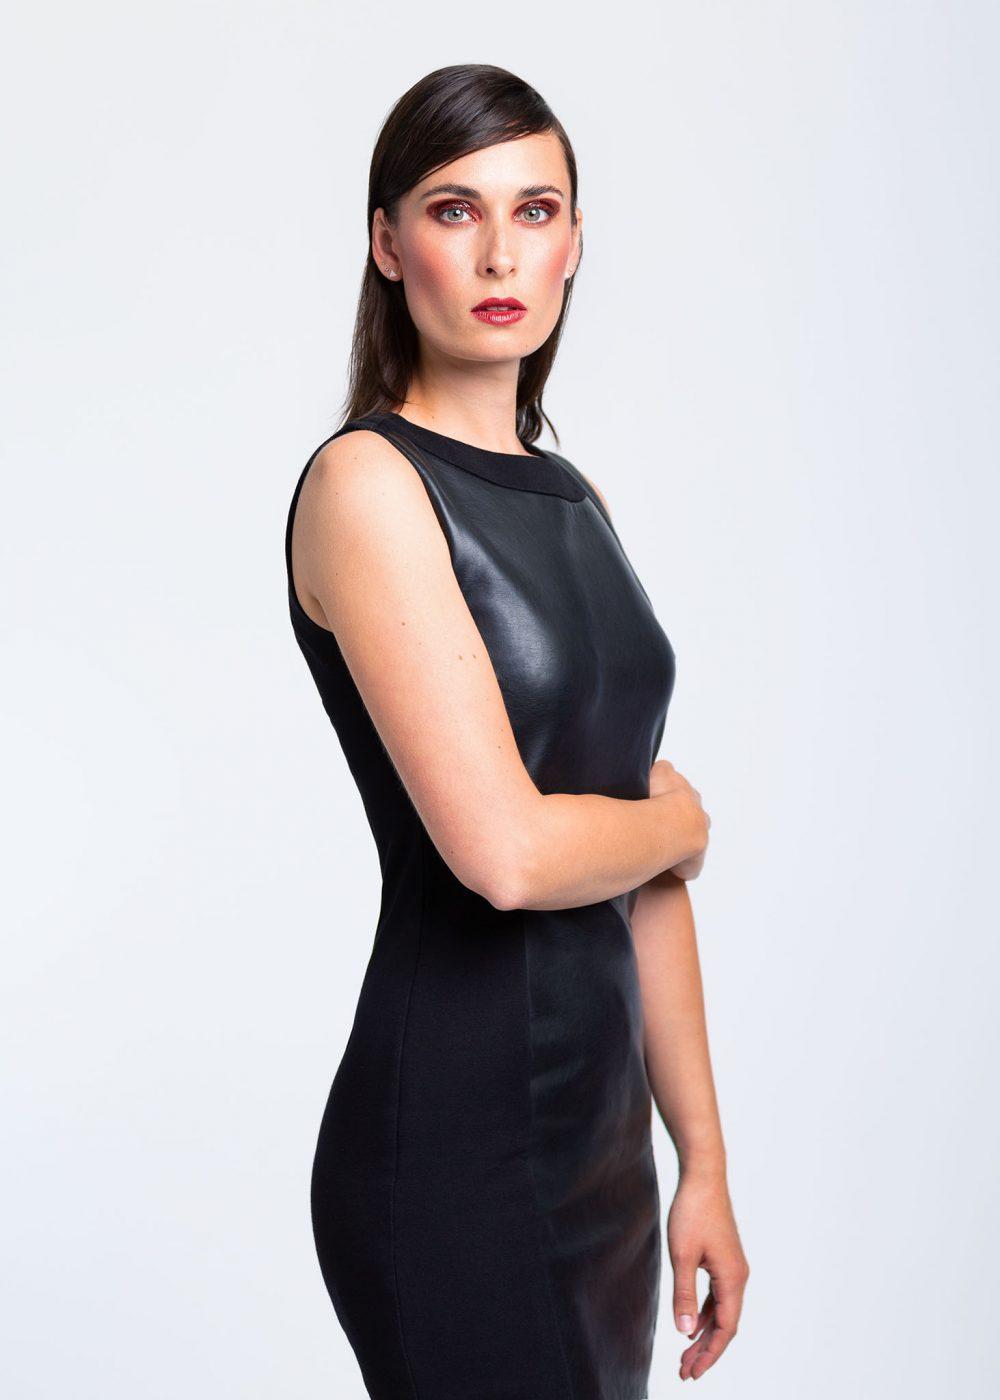 Fashion Fotografie - Helle Kammer Köln